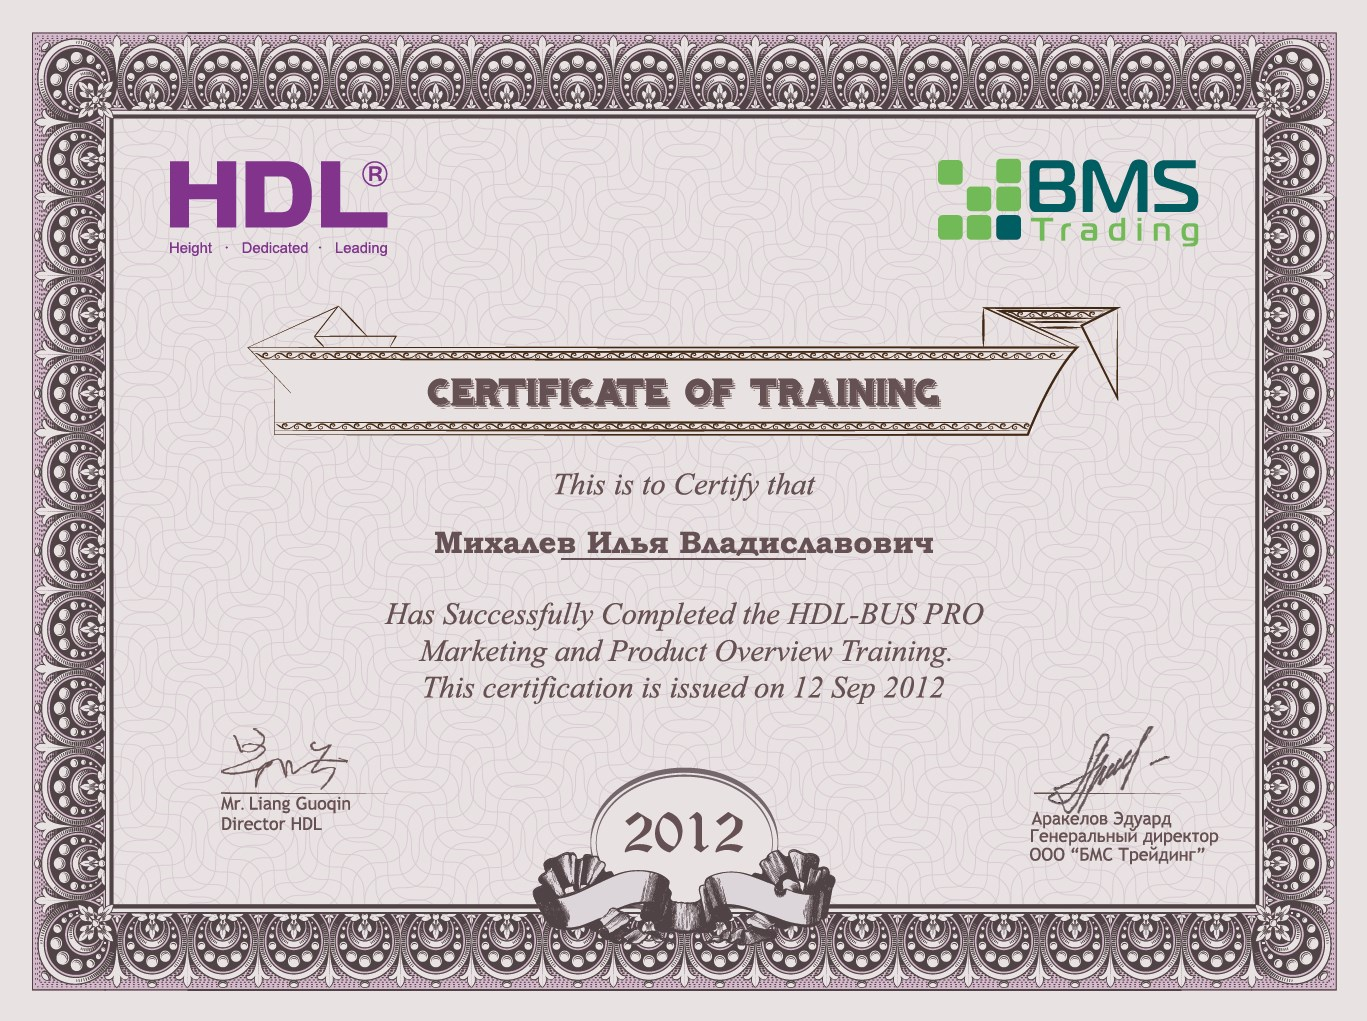 HDL BMS-T сертификат 2012